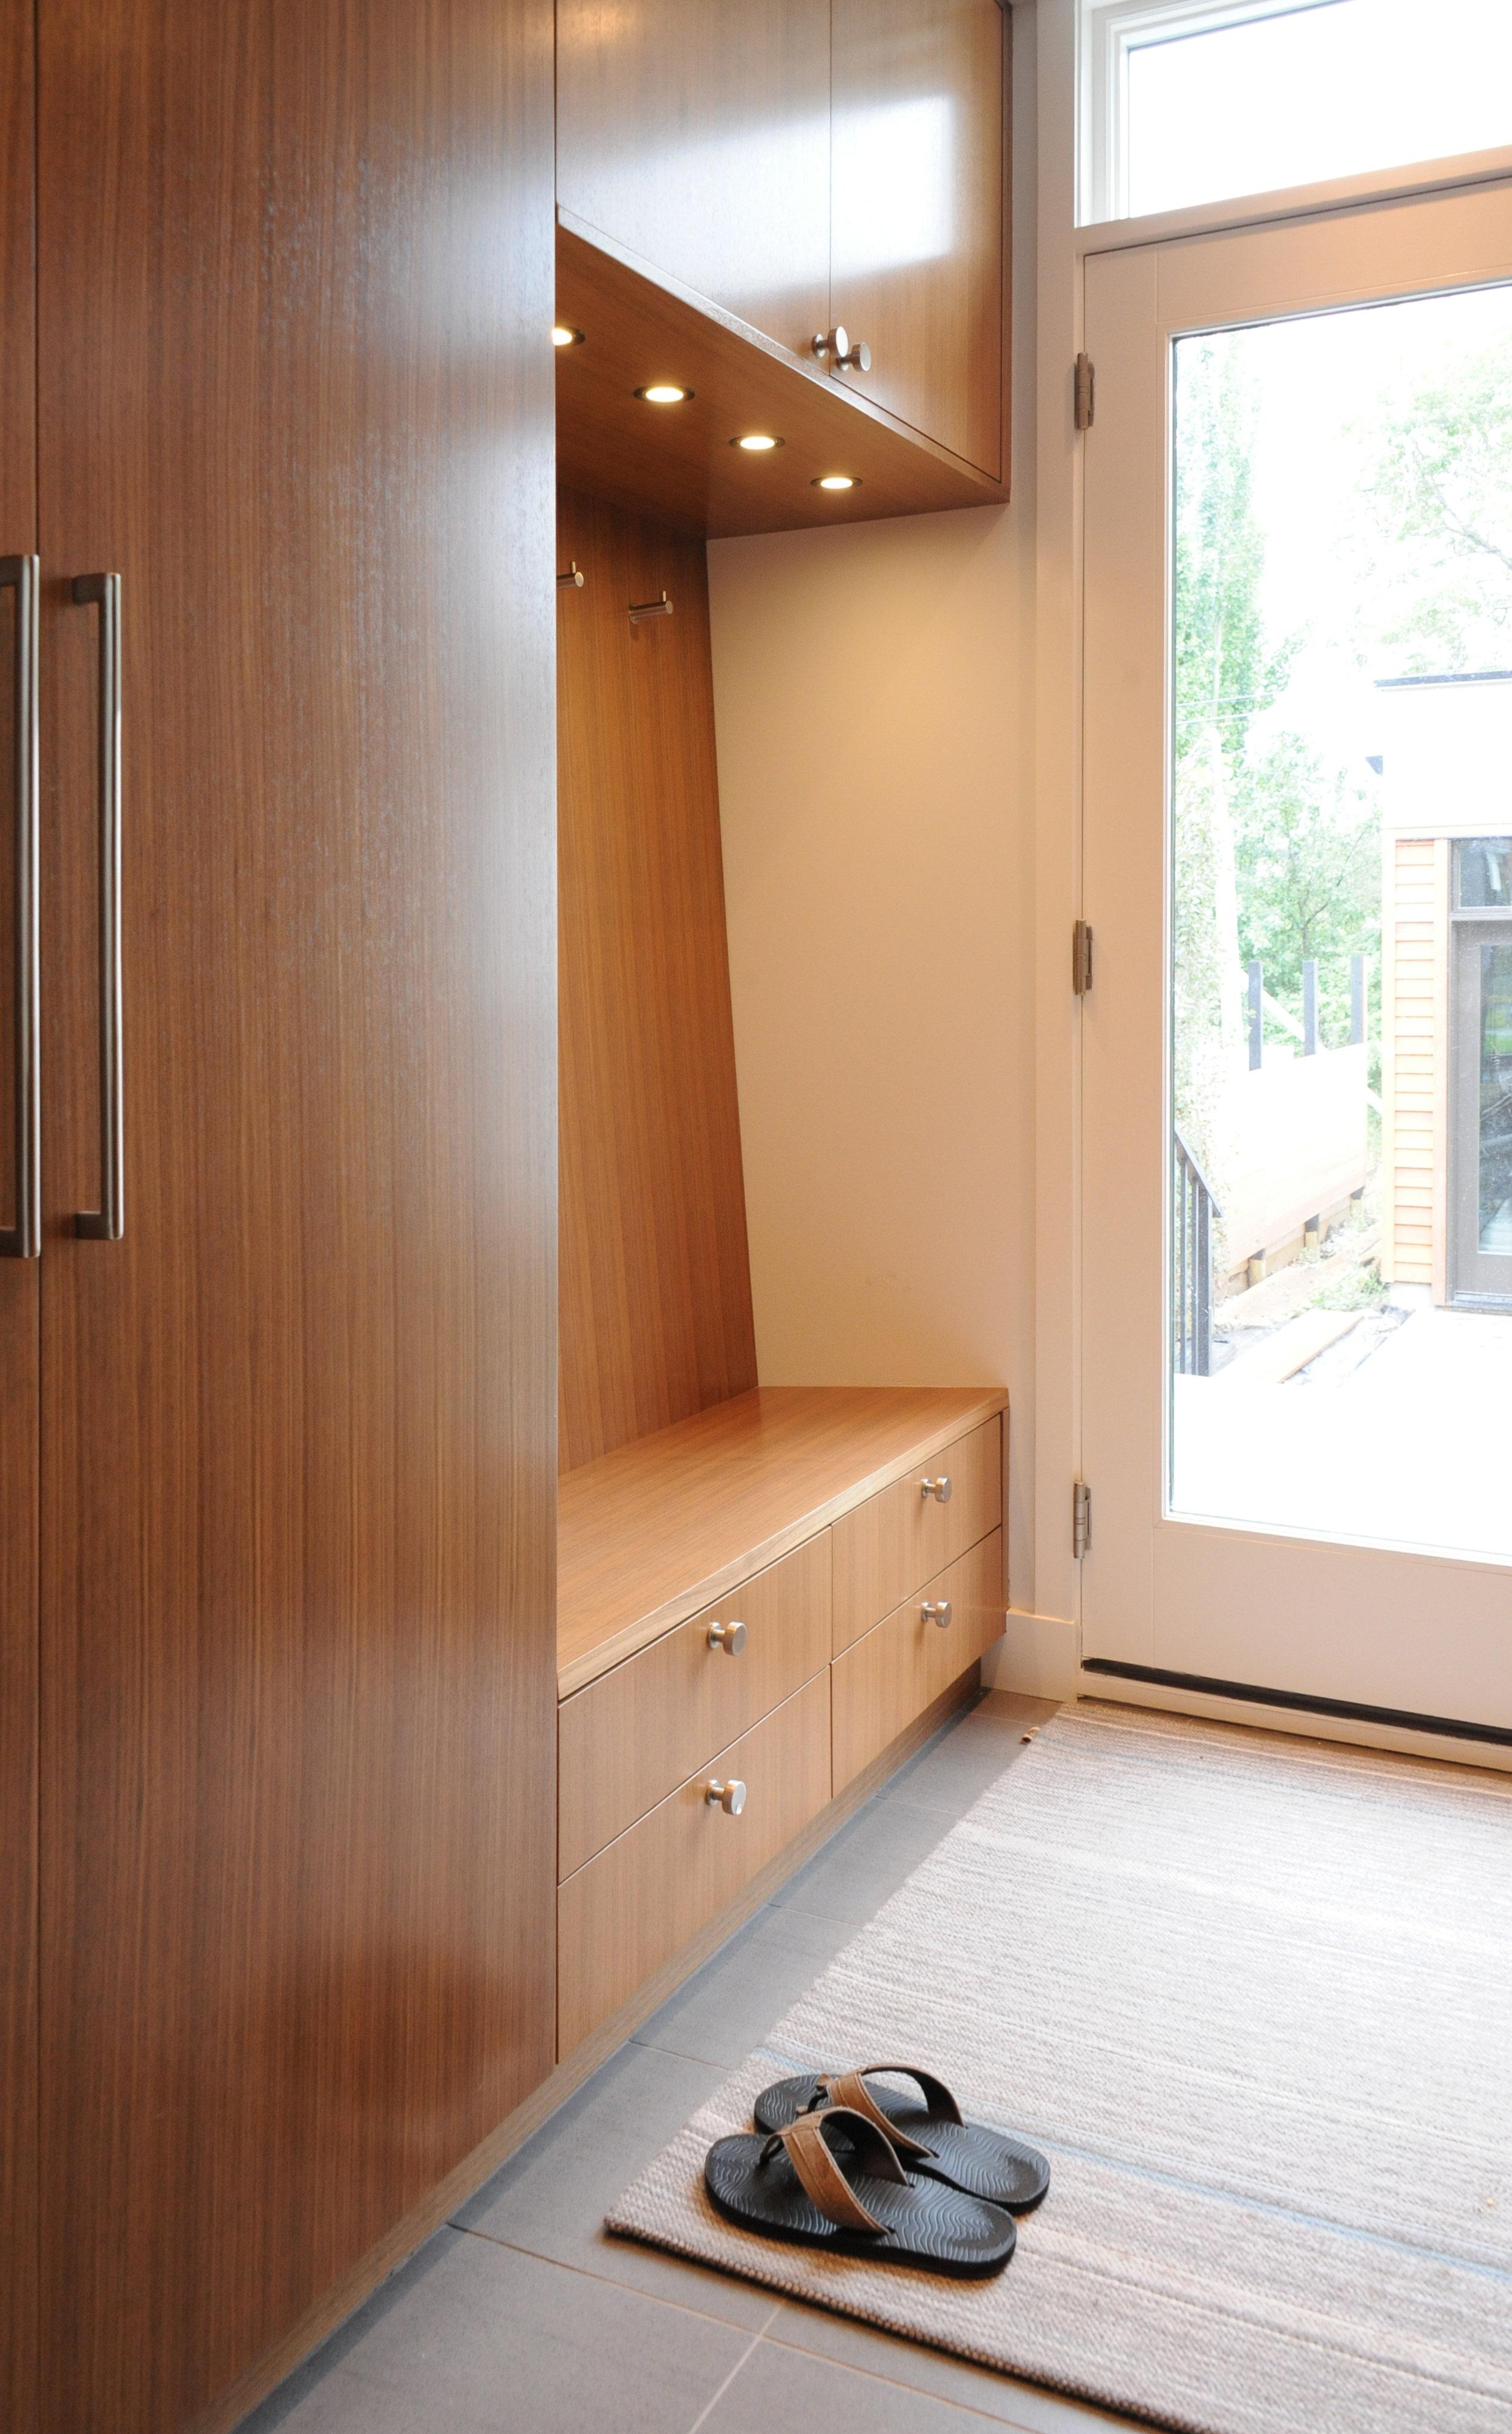 turkel_modern_design_prefab_home_bankview_house_calgary_cabinetry_storage.jpg